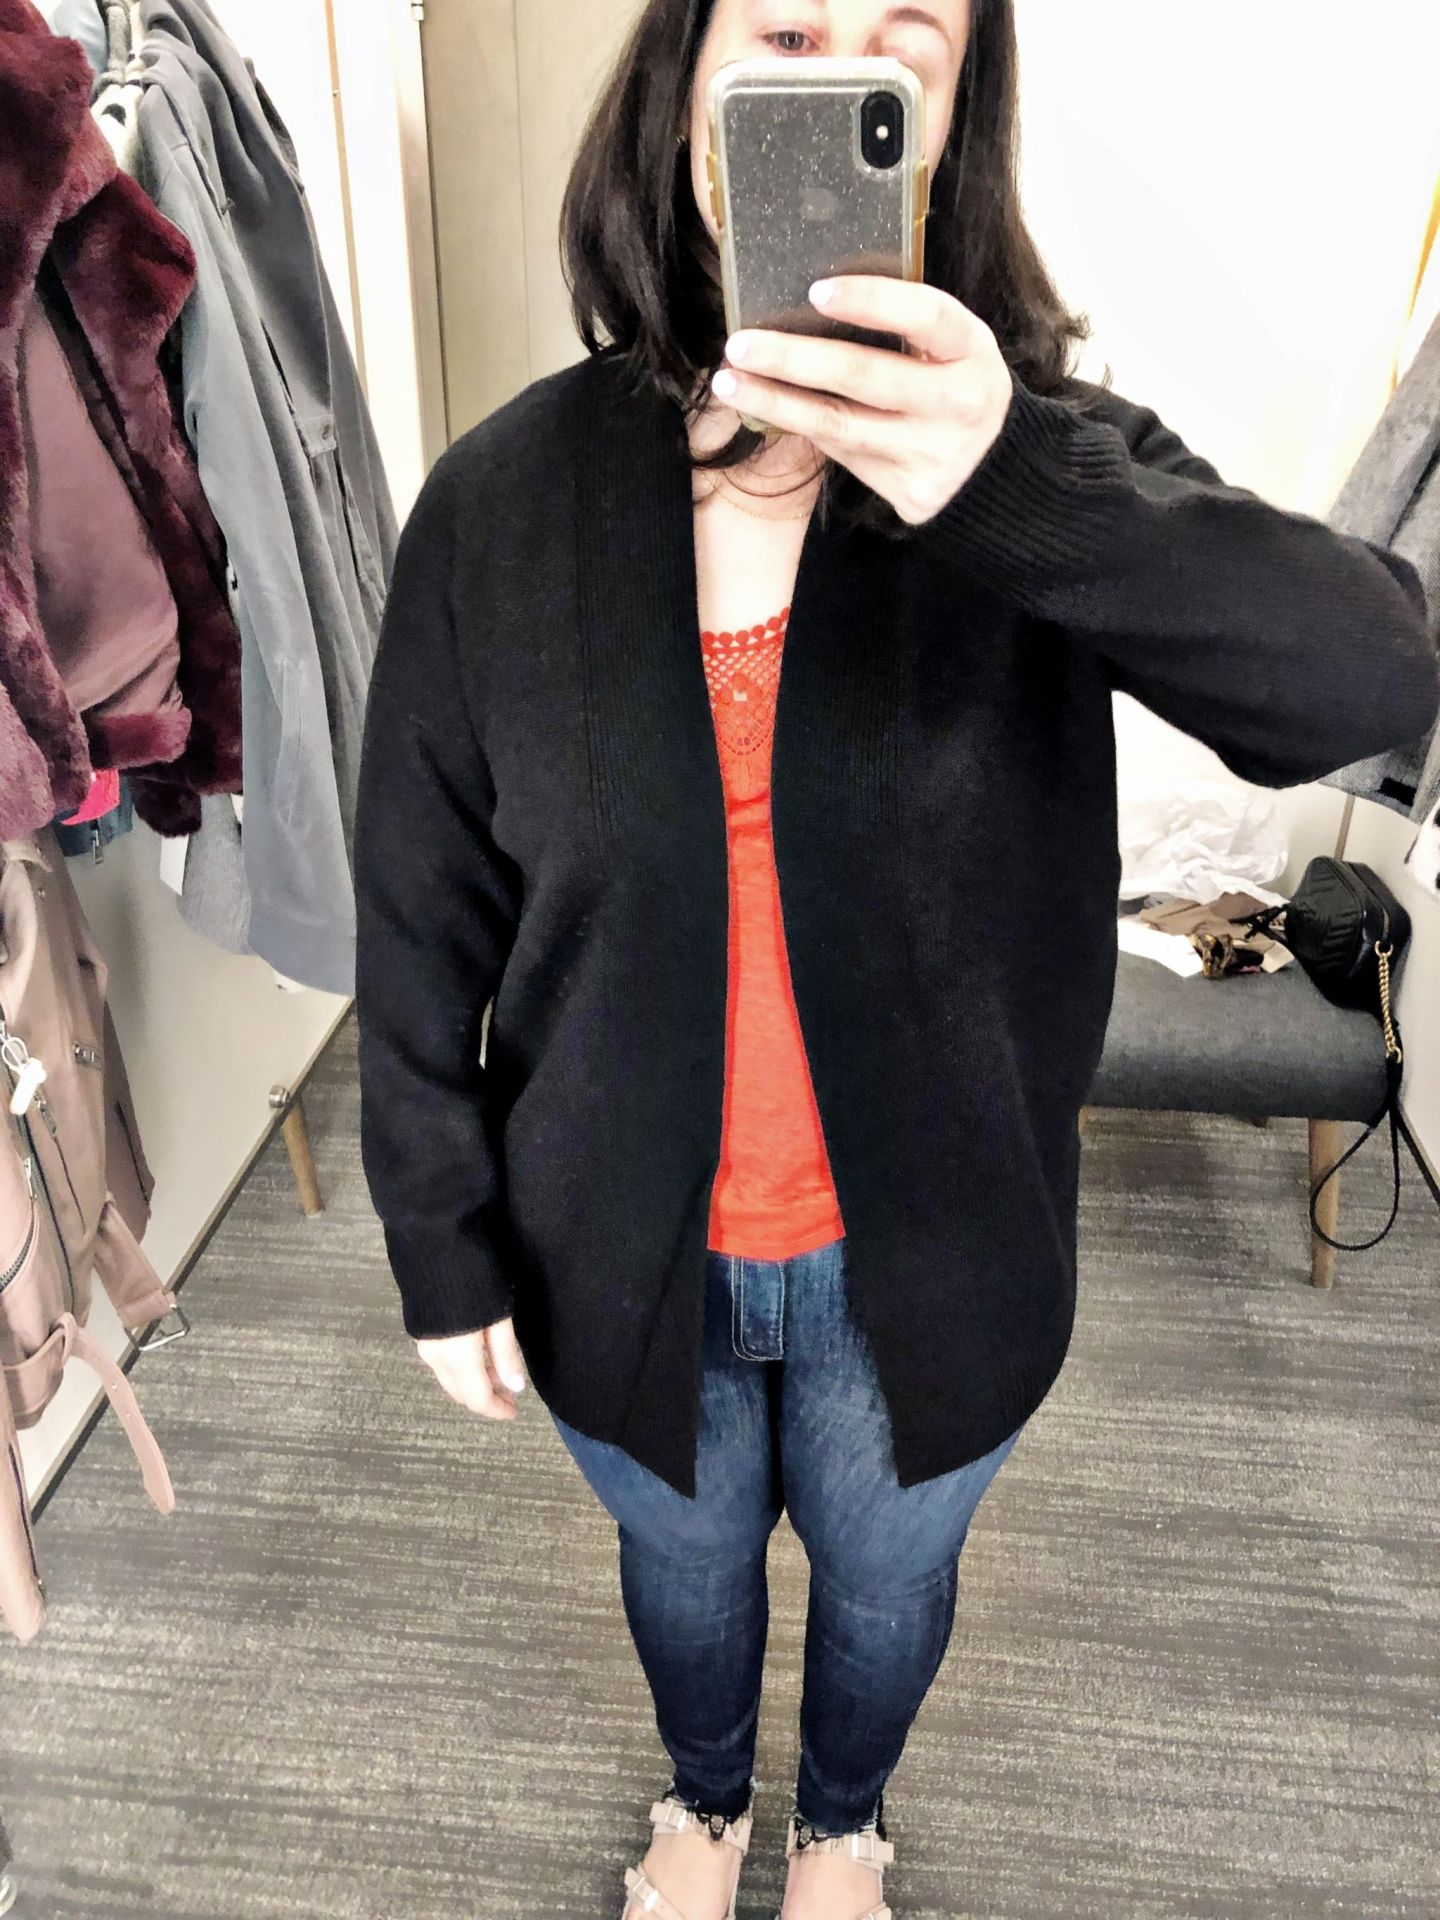 Vince Rib Trim Wool & Cashmere Cardigan | Anniversary Sale 2019 | Nordstrom Anniversary Sale Dressing Room Selfies